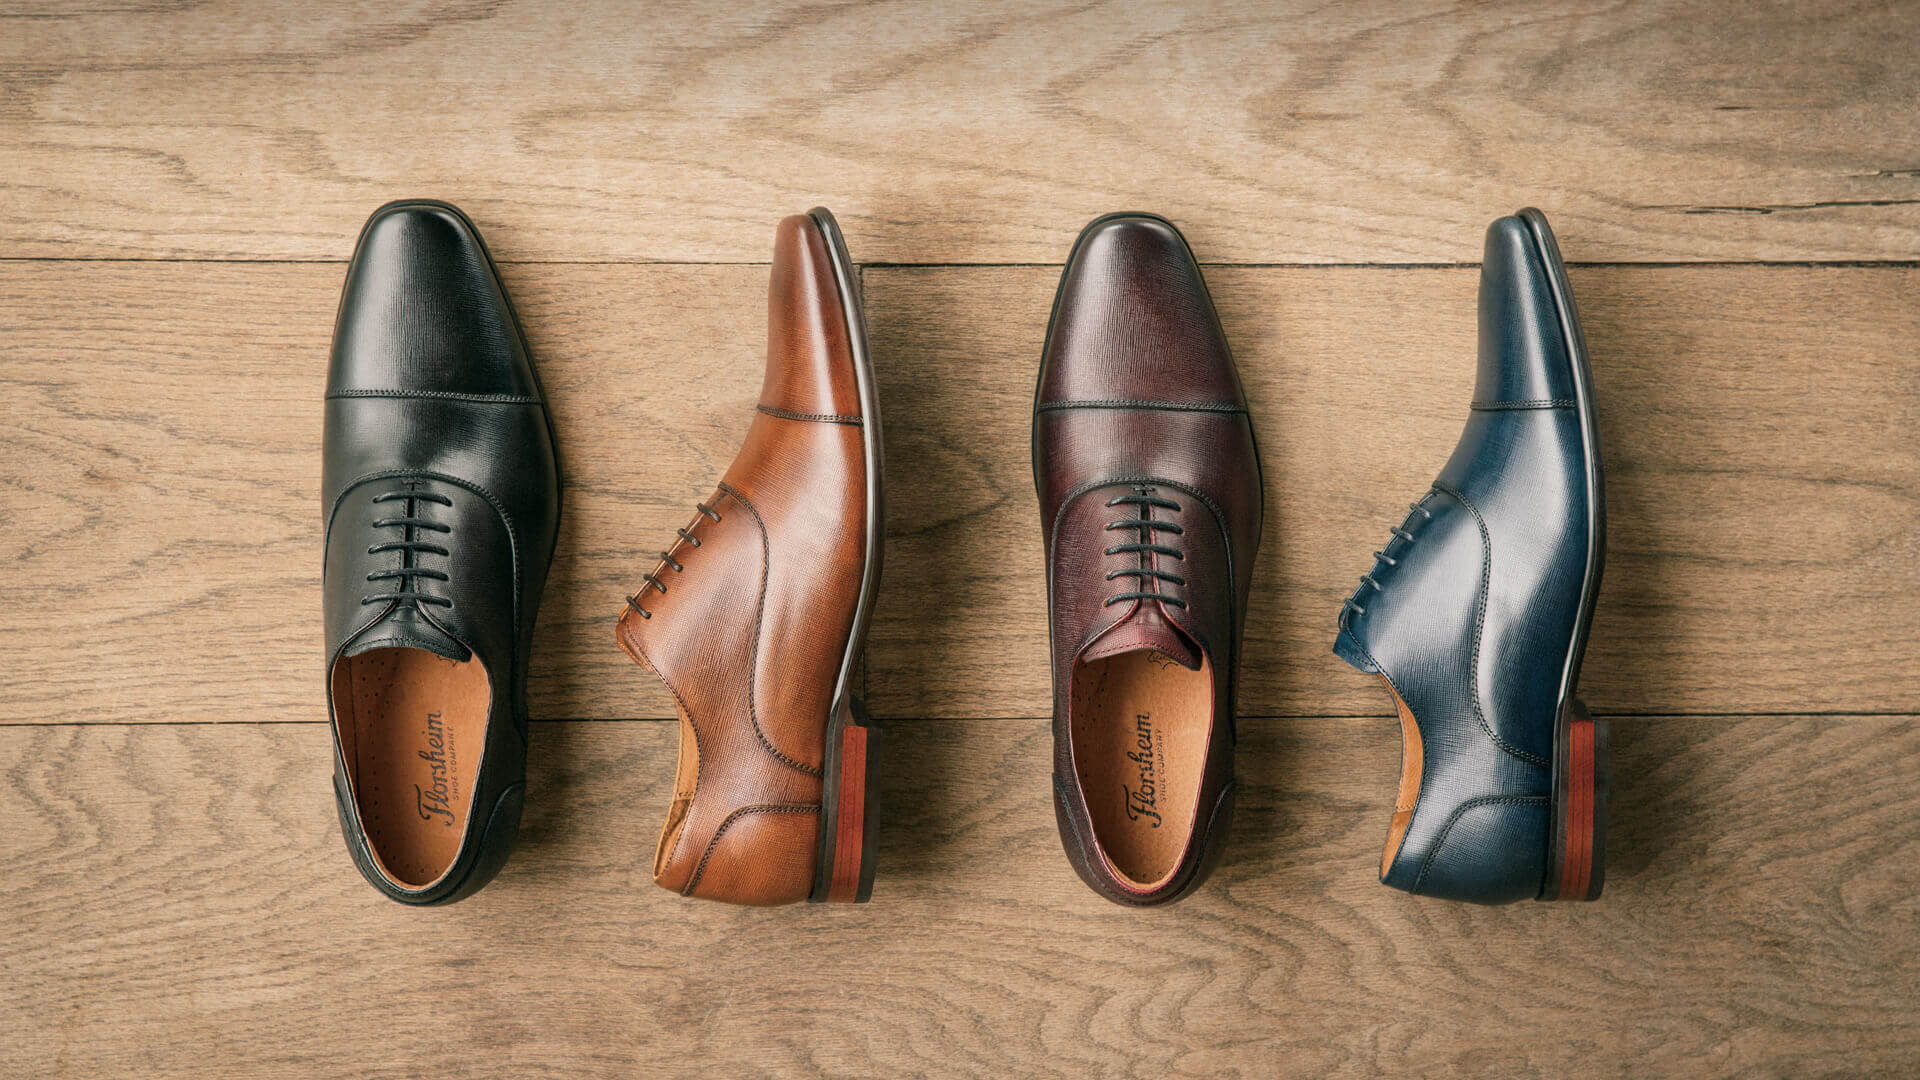 Background image for Florsheim Rewards, the loyalty program of Florsheim Shoes.